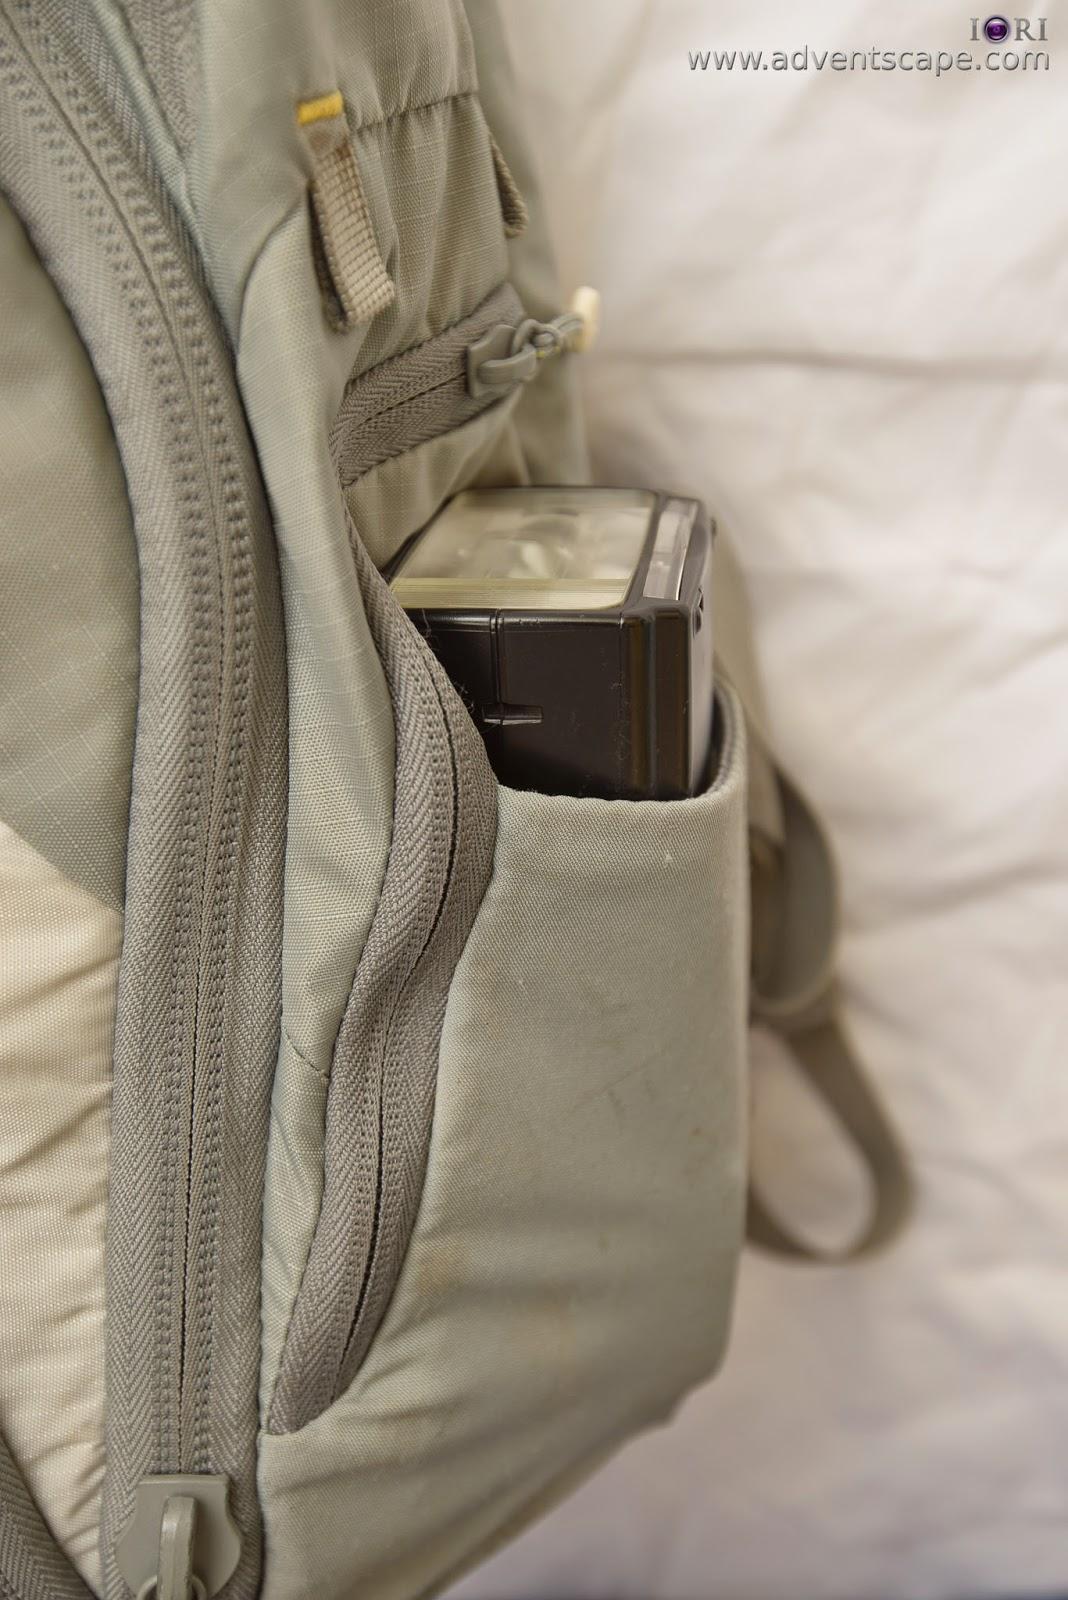 205, adventscape, Australian Landscape Photographer, bag, Bug, Kata, Manfrotto, Philip Avellana, review, pockets, pouch